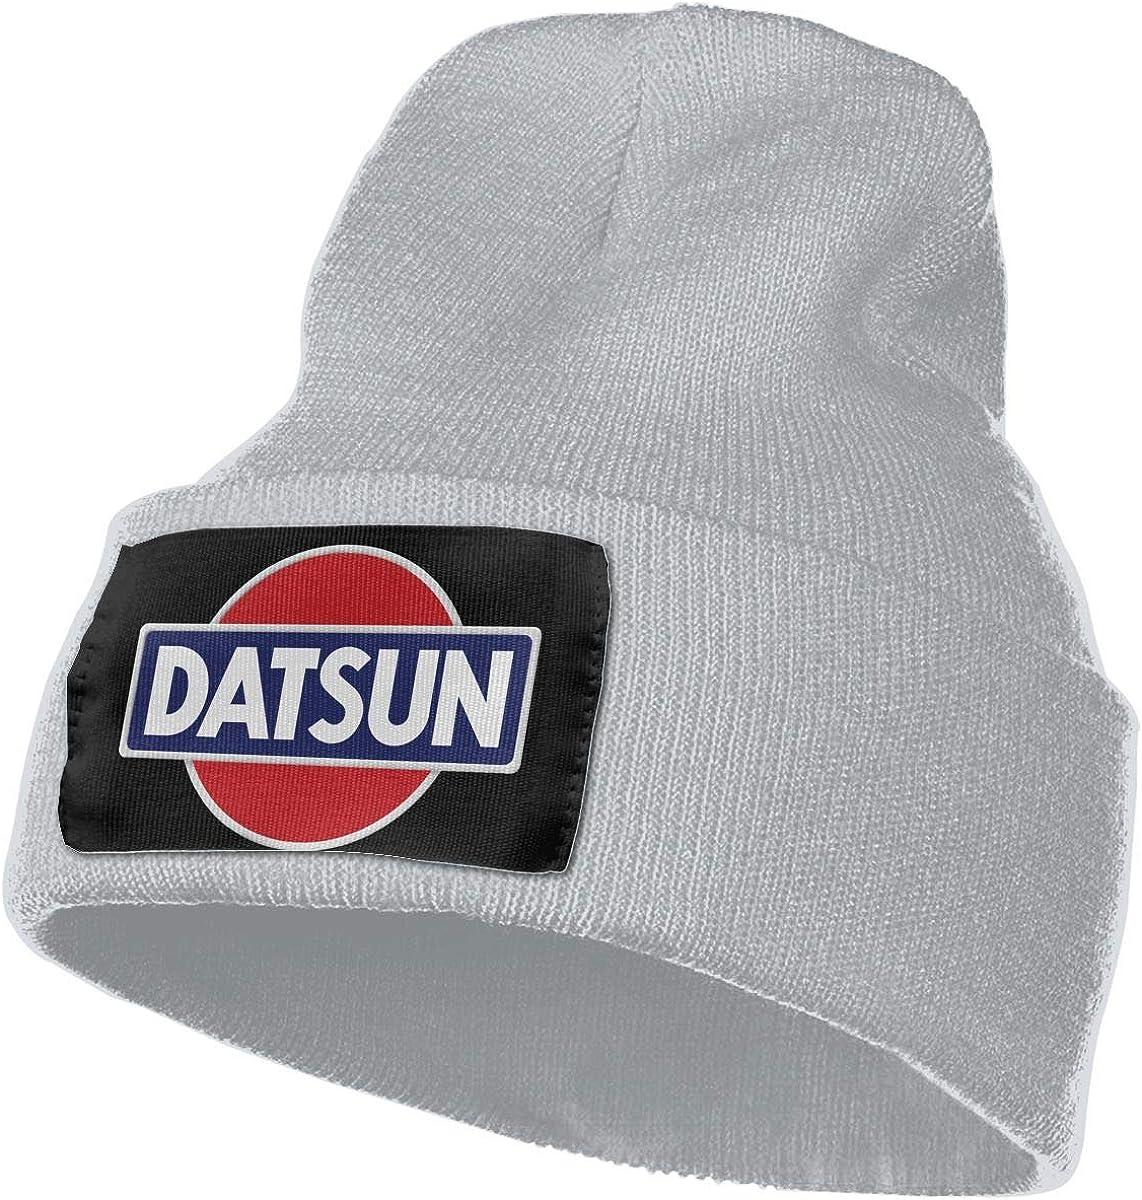 SLADDD1 Badge Symbol Warm Winter Hat Knit Beanie Skull Cap Cuff Beanie Hat Winter Hats for Men /& Women